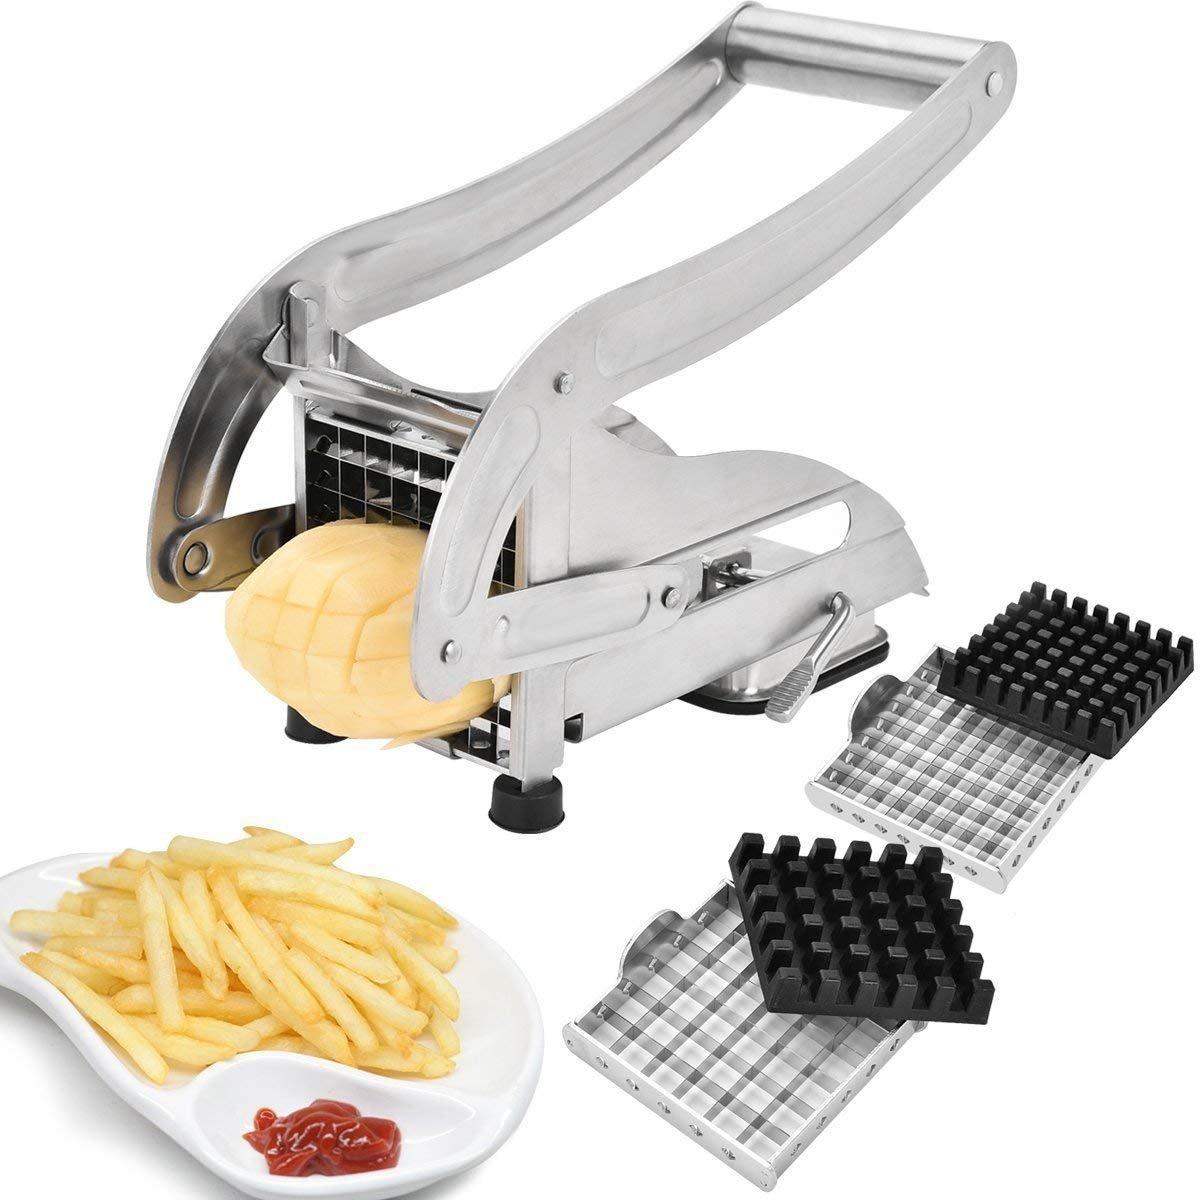 EEO Stainless Steel French Fries Potato Cutter 2 Interchangeable Blades Sucker Bottom Fruit Veg into Finger Sticks Sopito